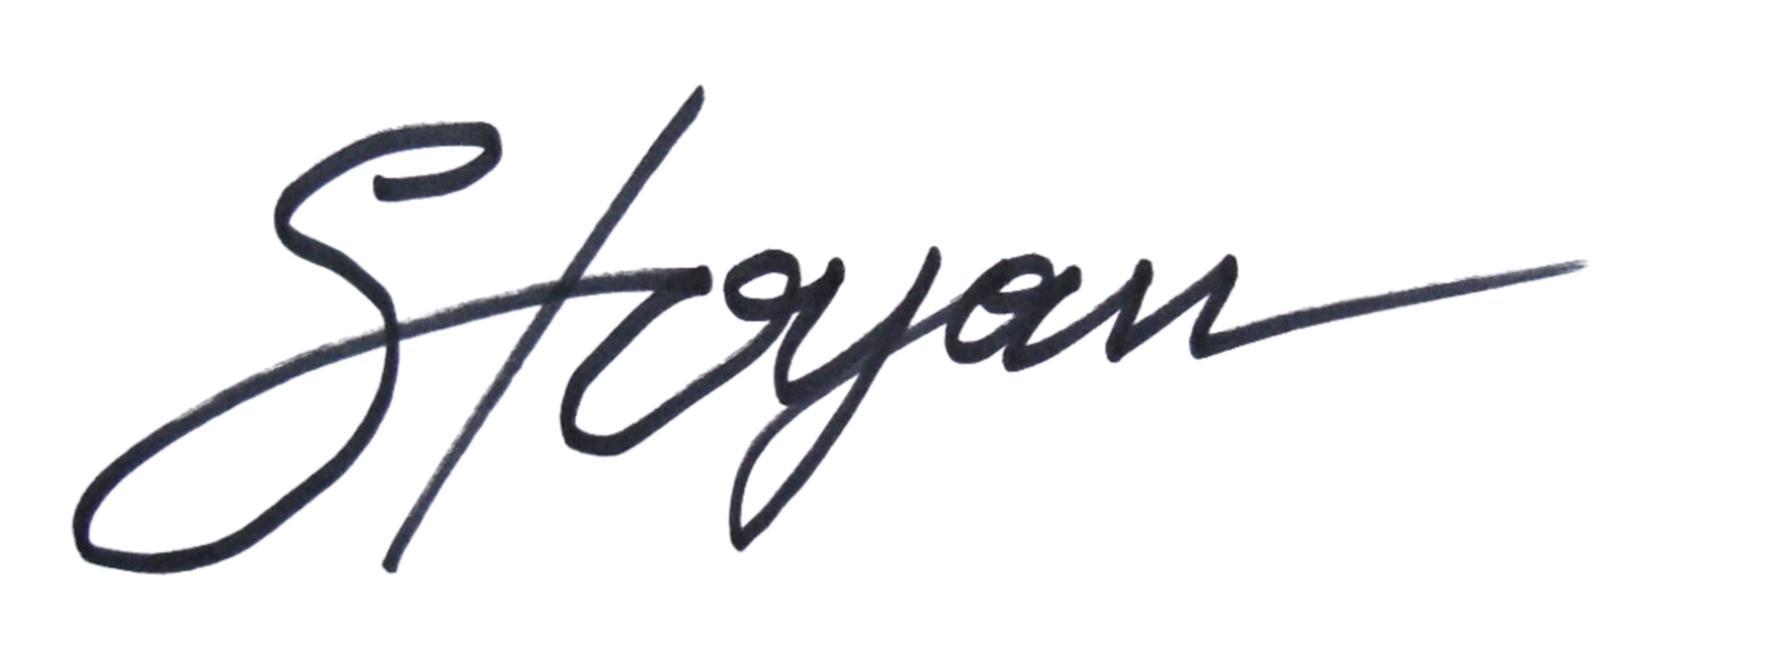 stoyan lechtevski Signature